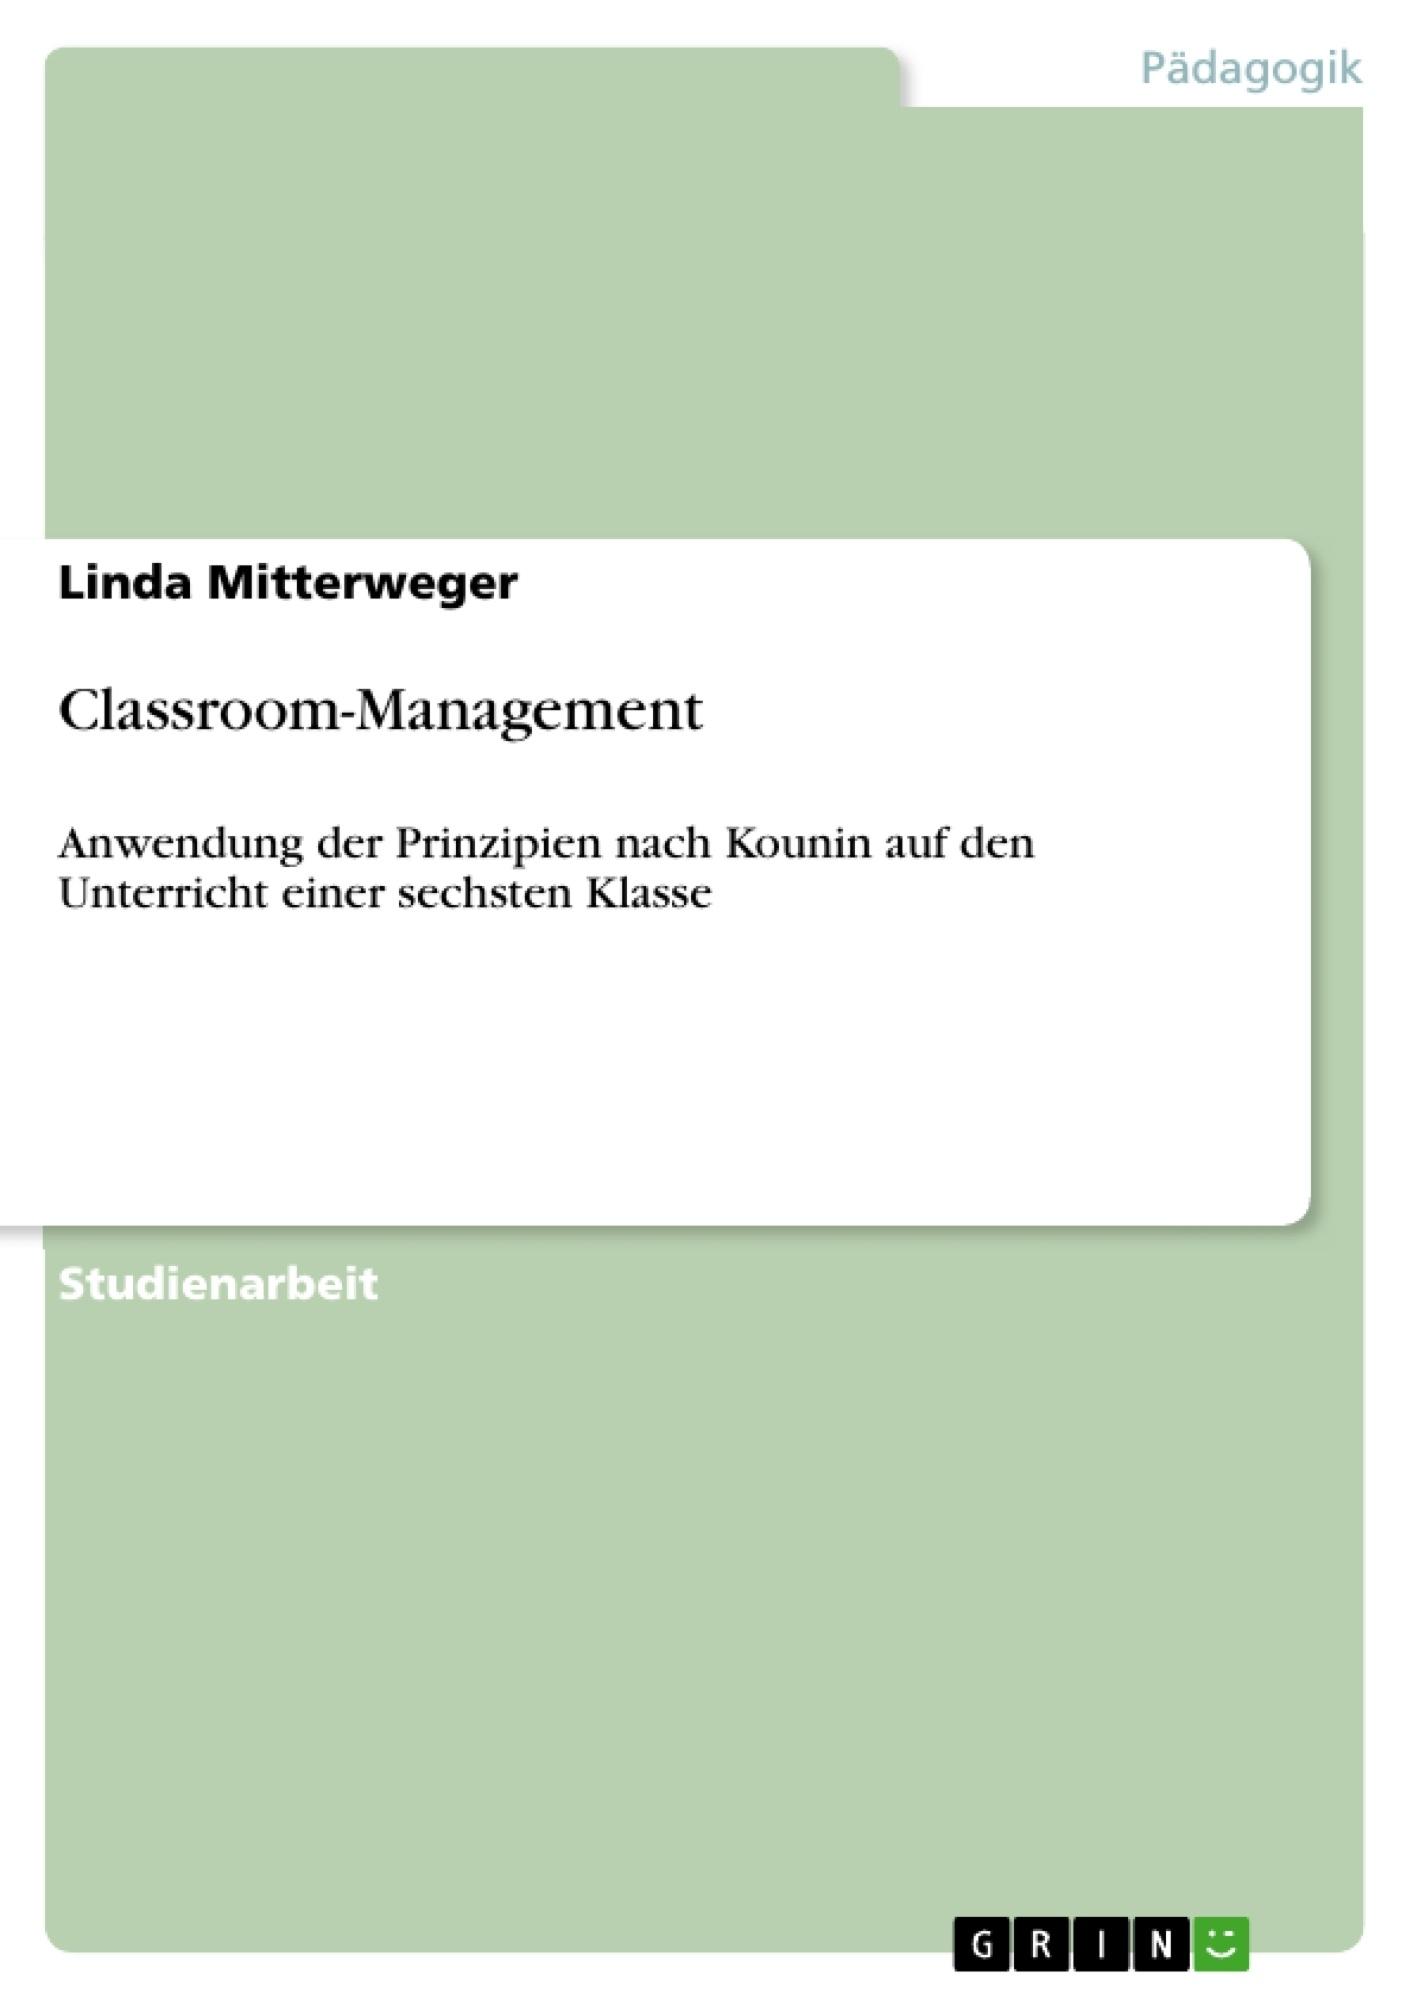 Titel: Classroom-Management